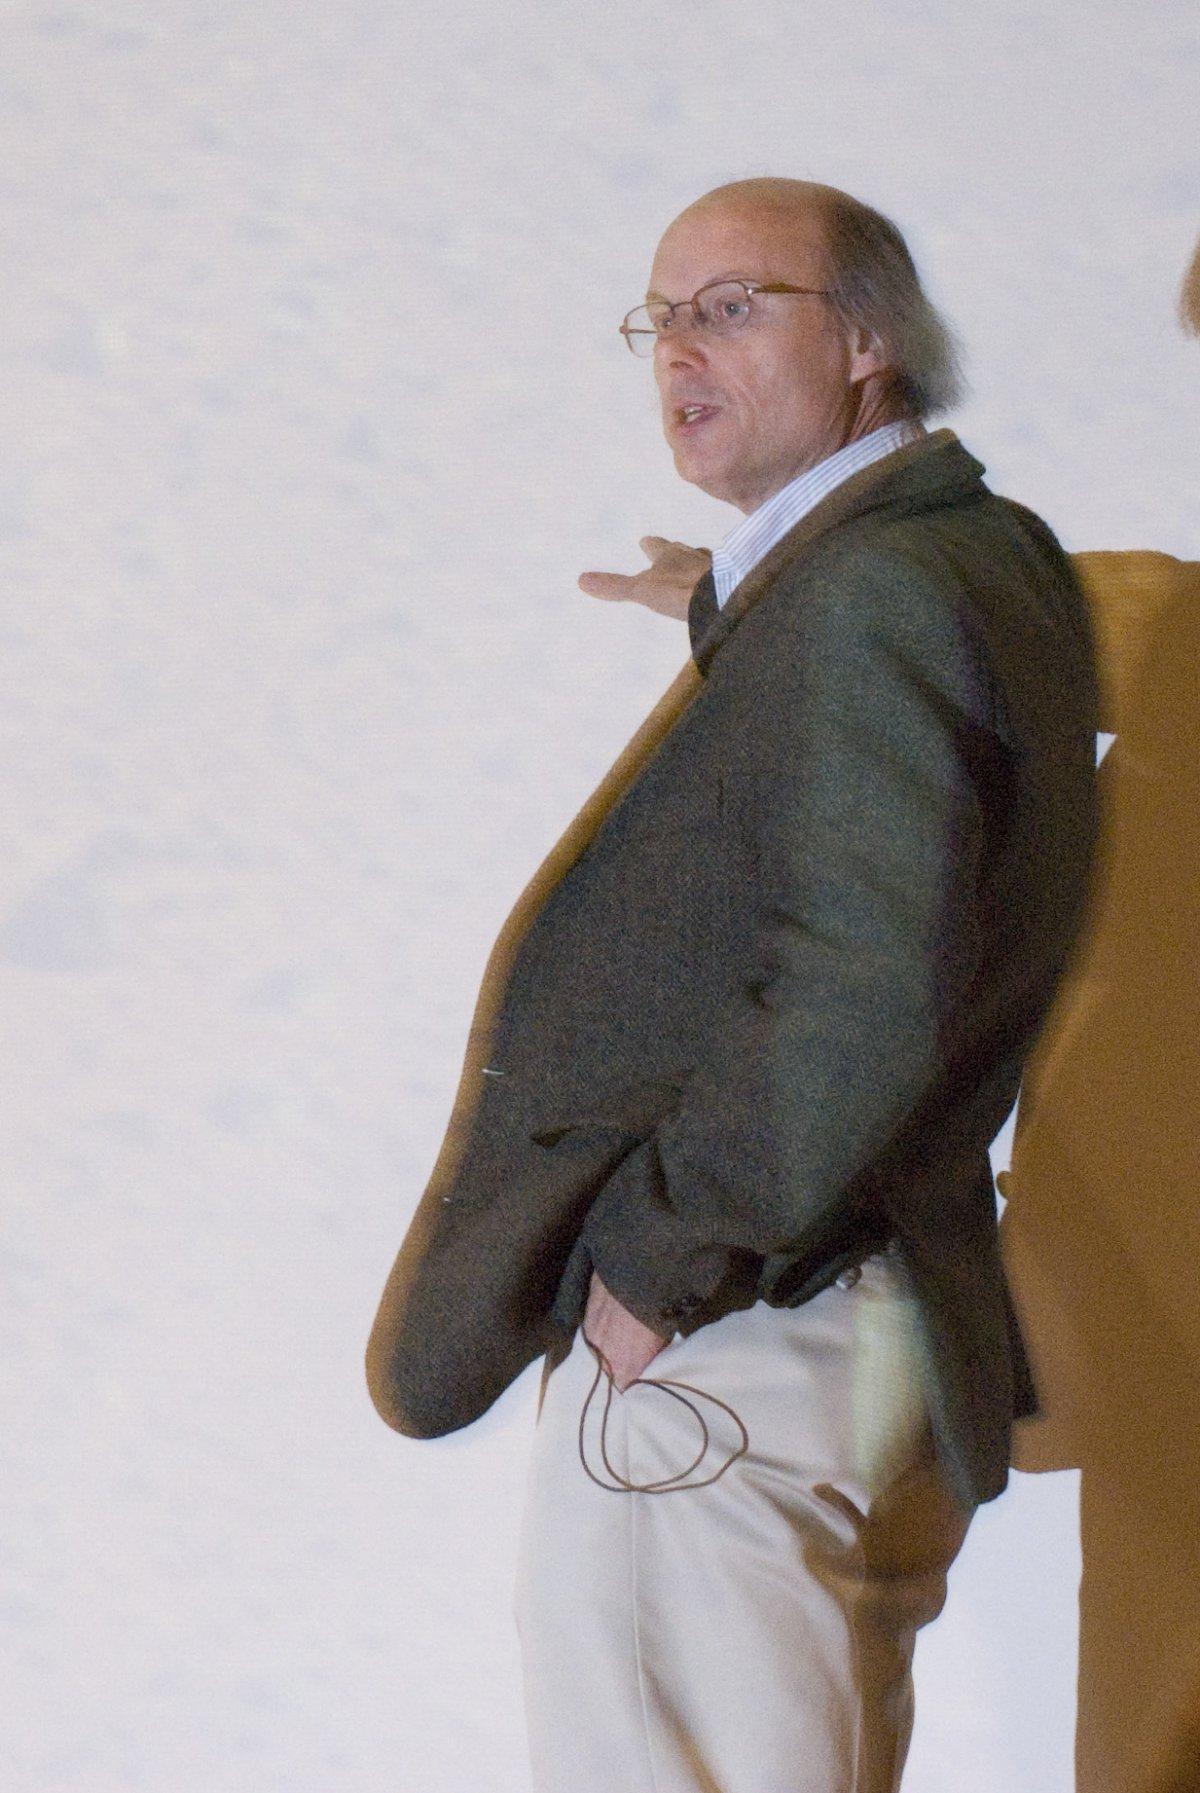 Bjarne Stroustrup, inventor of C++